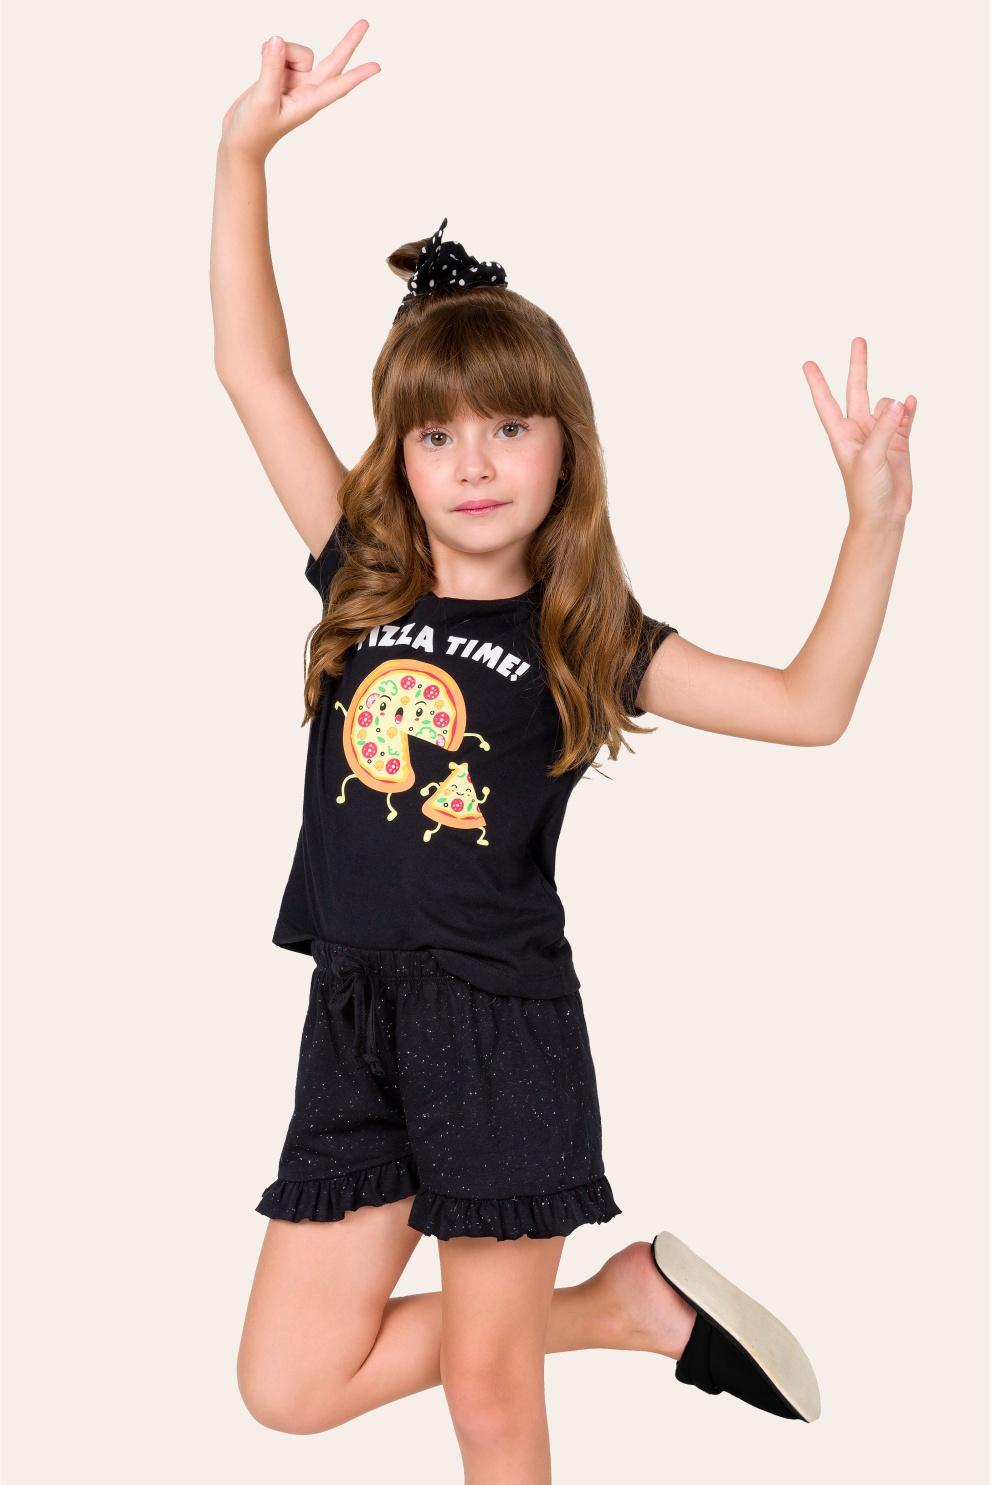 041/C - Pijama Infantil Feminino Pizza Time - Família